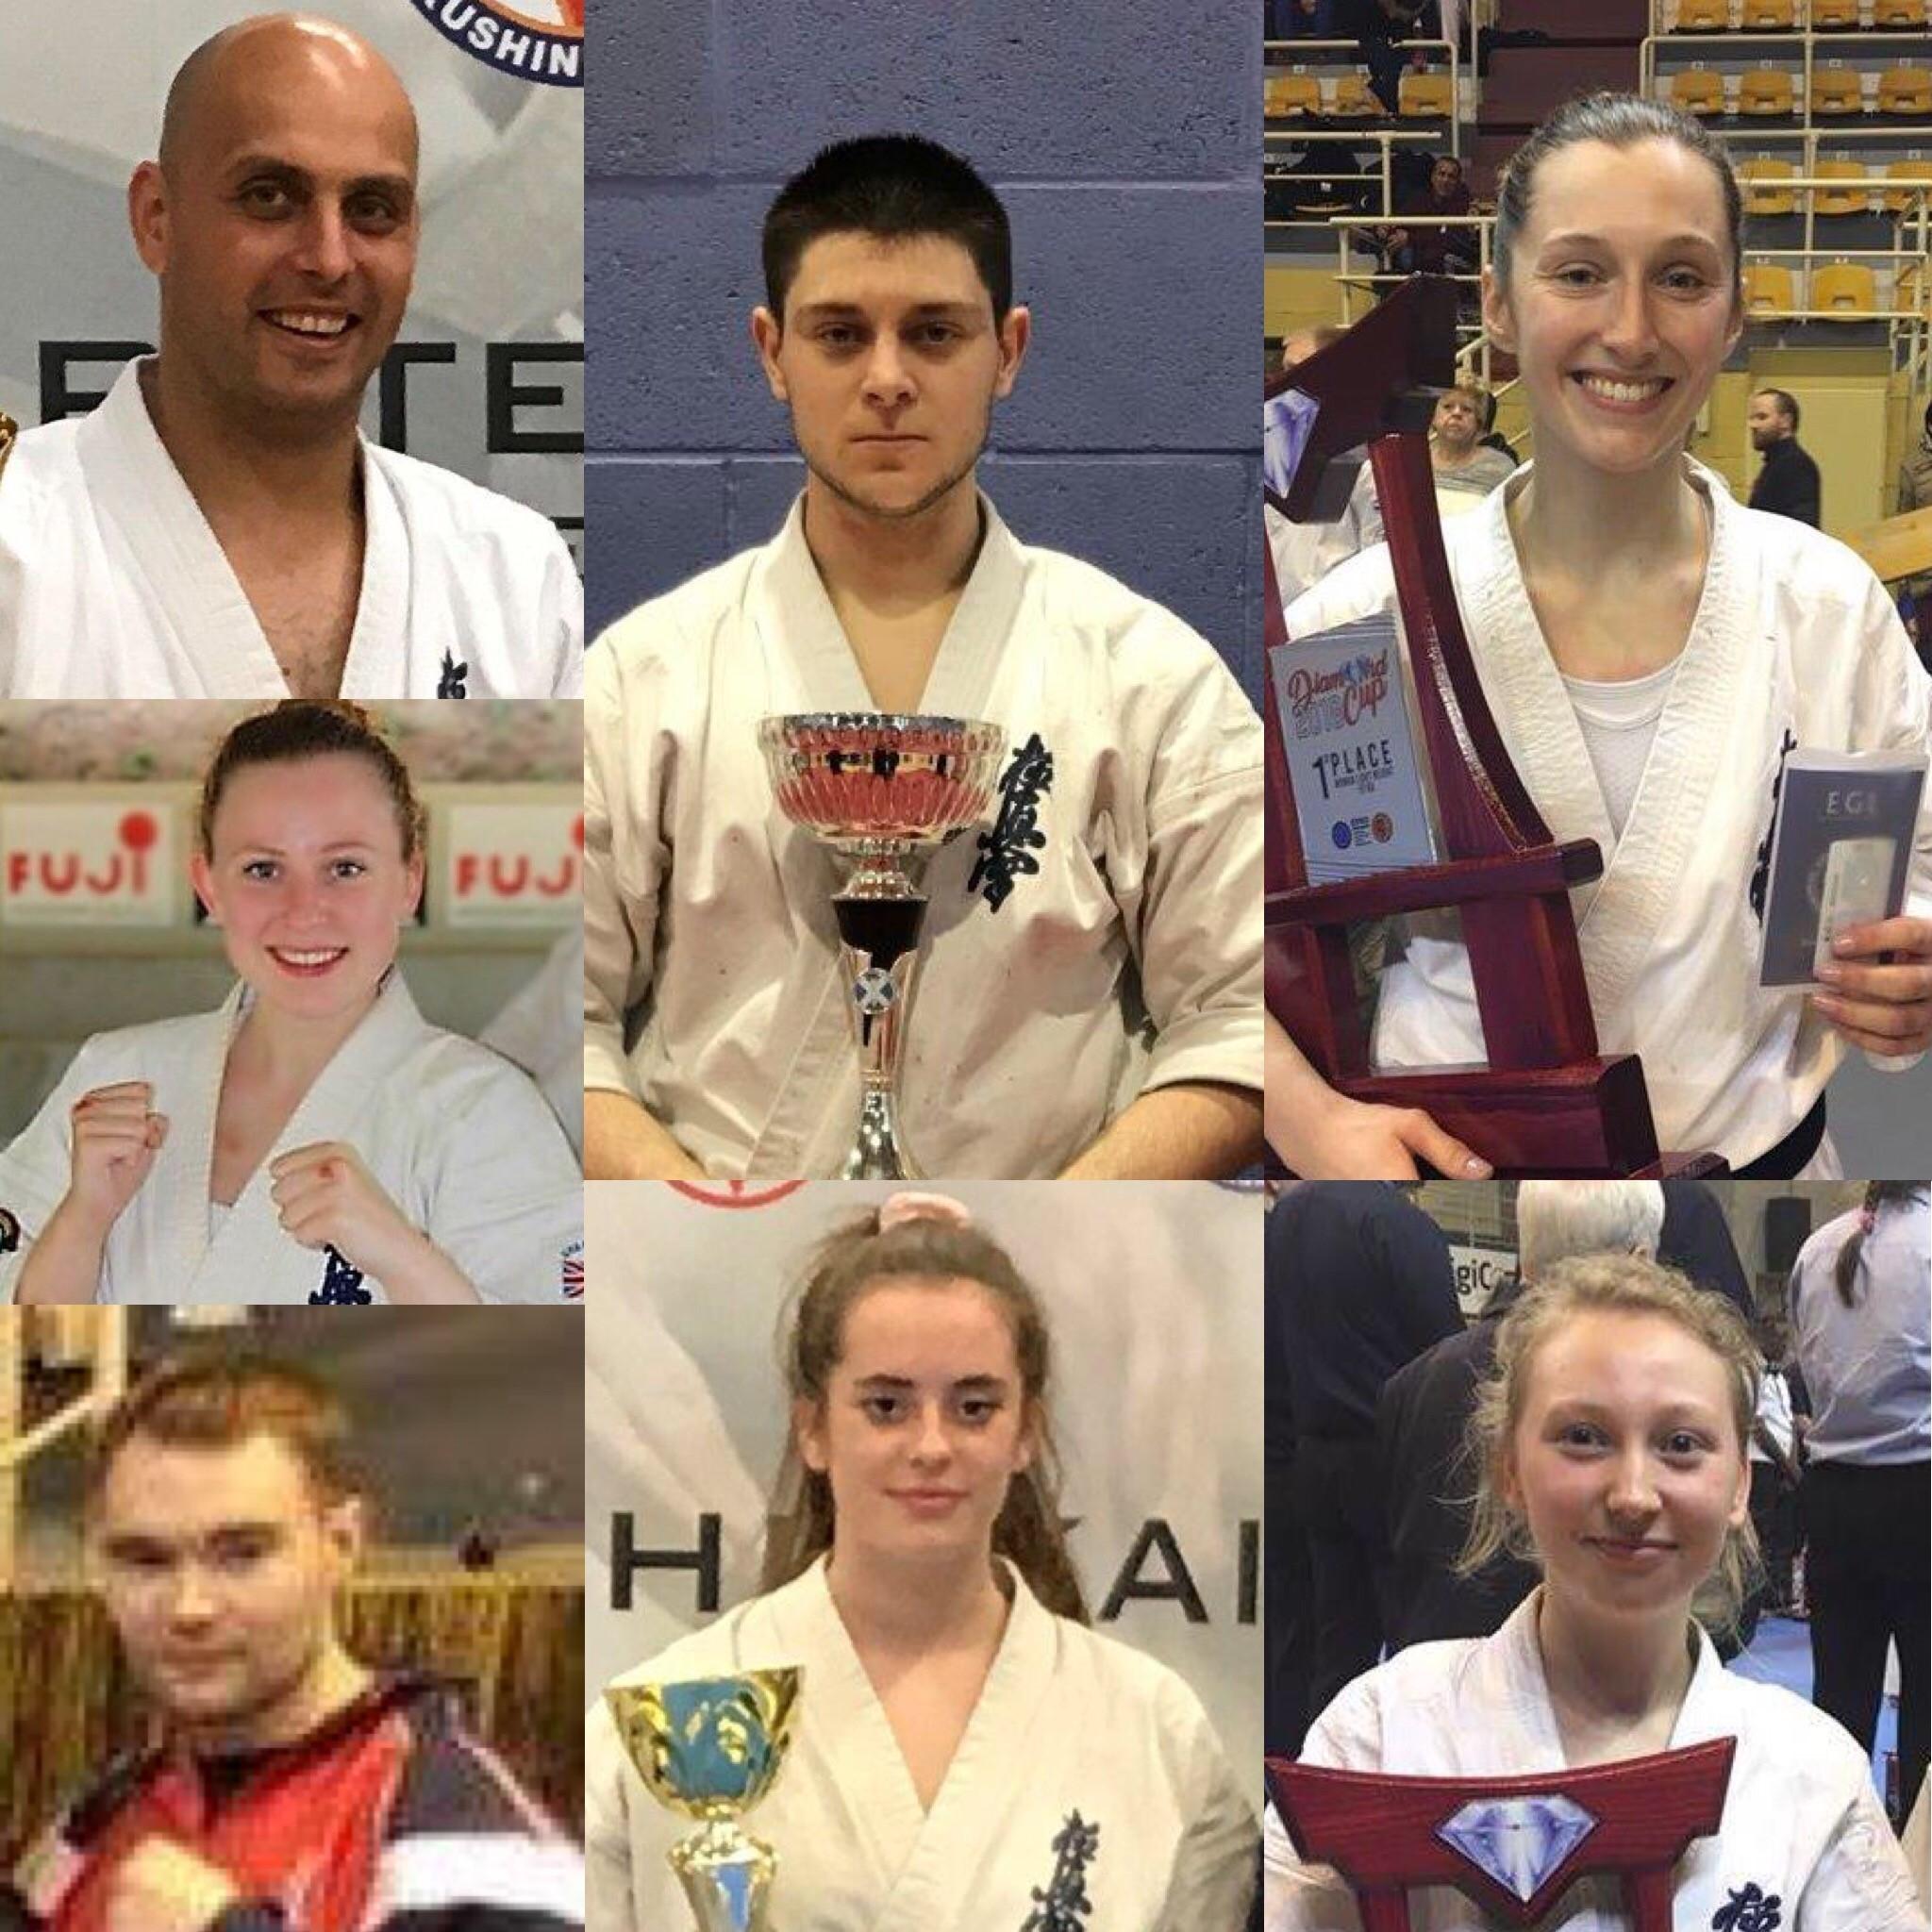 (clockwise): Gab Barbu, Blake Collins, Emma Markwell, Jaime-May Rowlands, Beth Salvi, Luke Baldwin, Hayley-Beth Rowlands